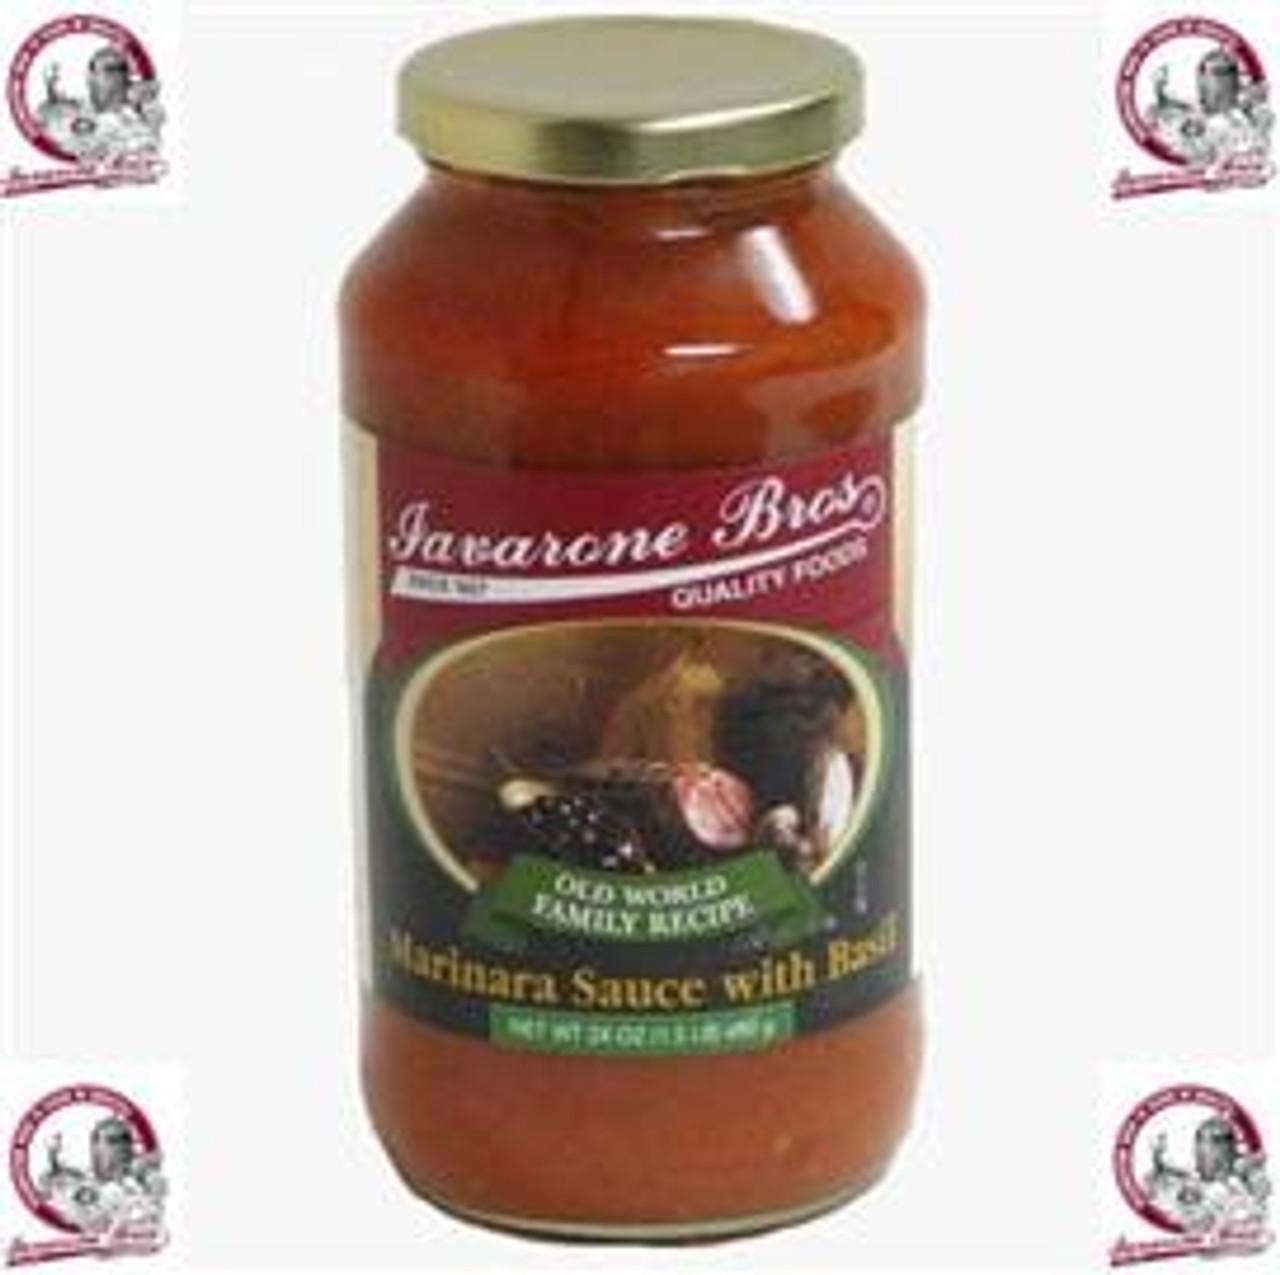 Marinara Sauce with Basil- Old World Family Recipe